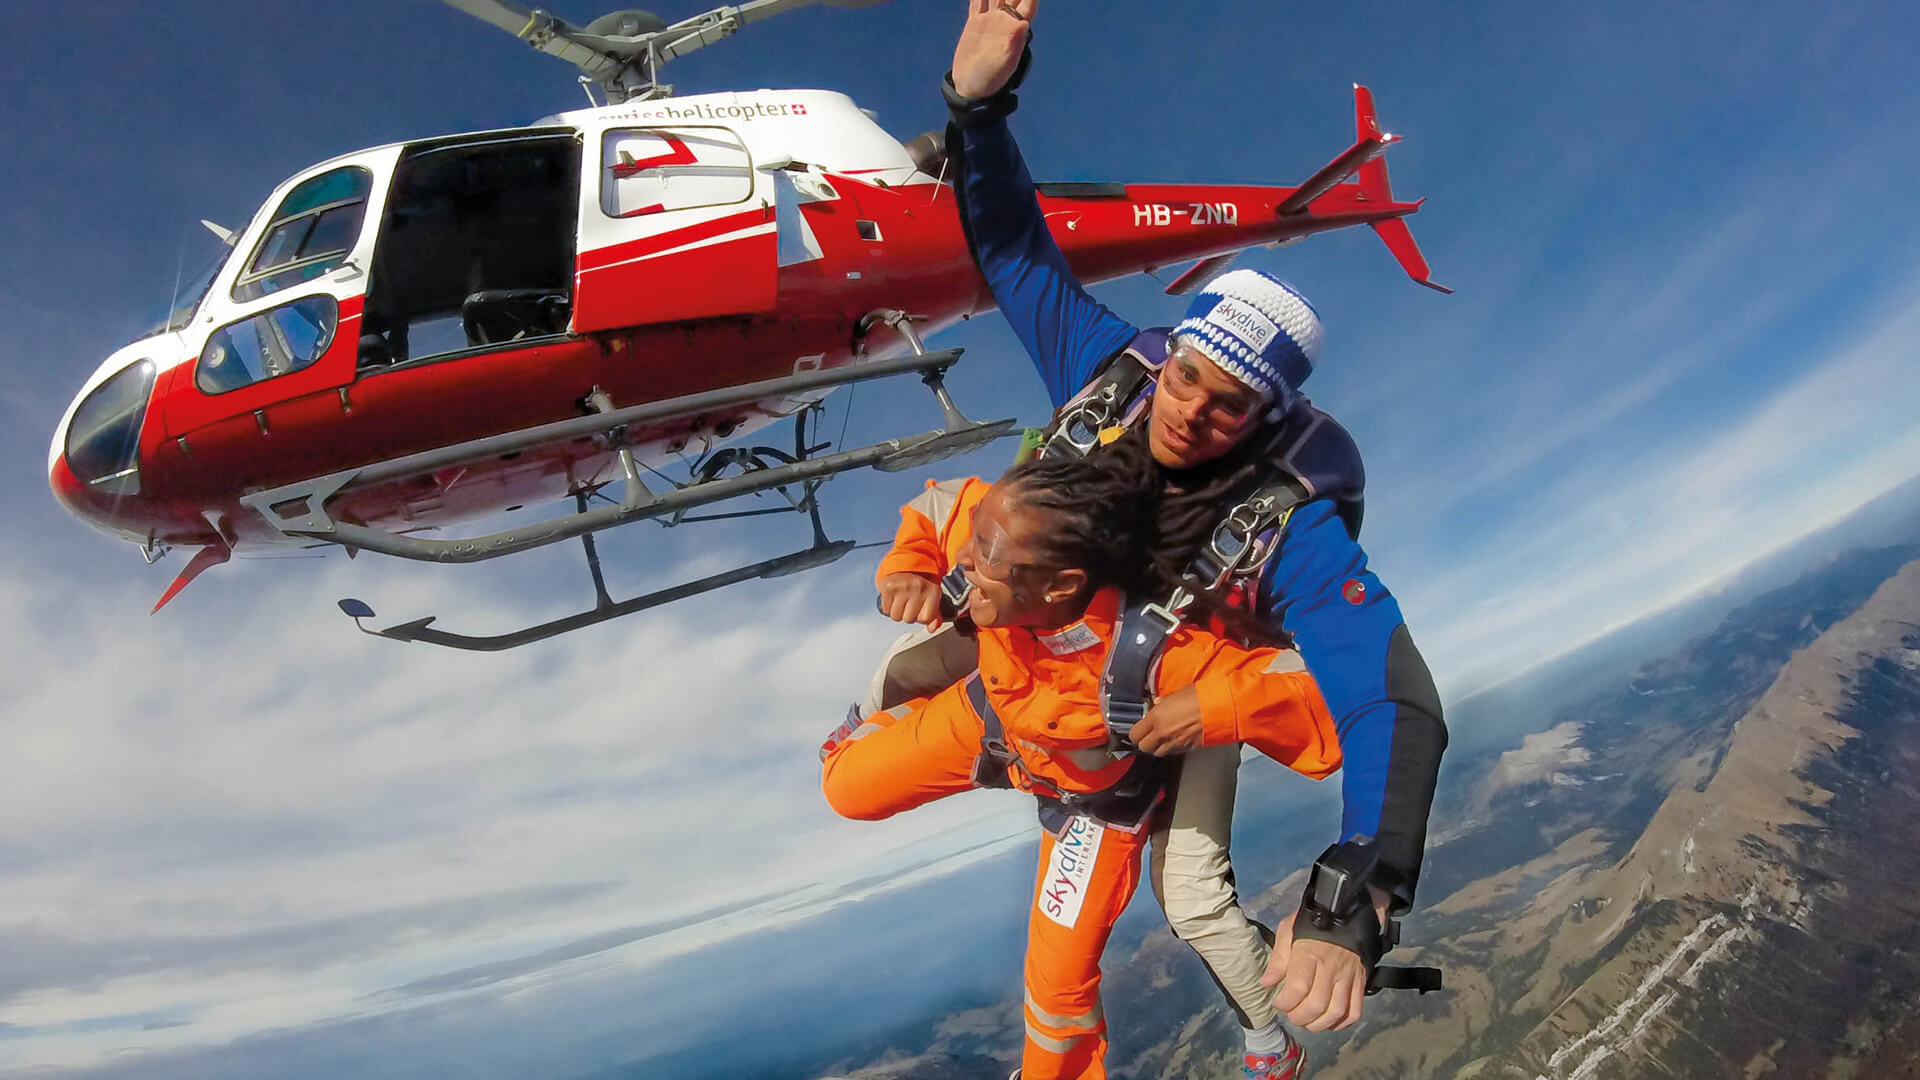 skydive-interlaken-helikopter-jump-sommer